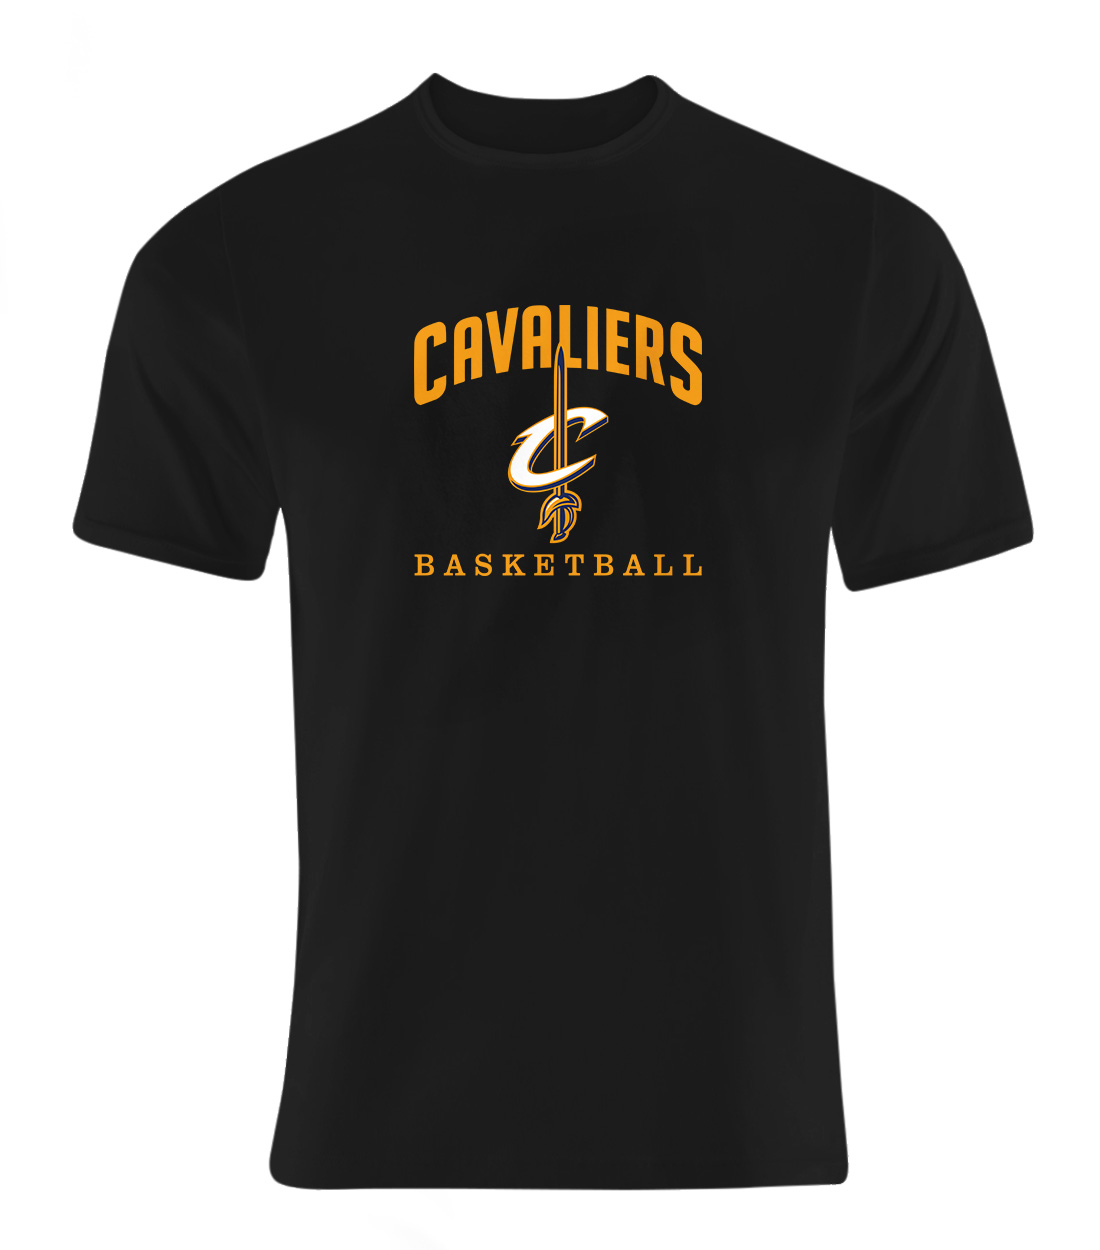 Cleveland Cavaliers Tshirt (TSH-BLC-NP-61-NBA-CLE-CAVS.ARCH)